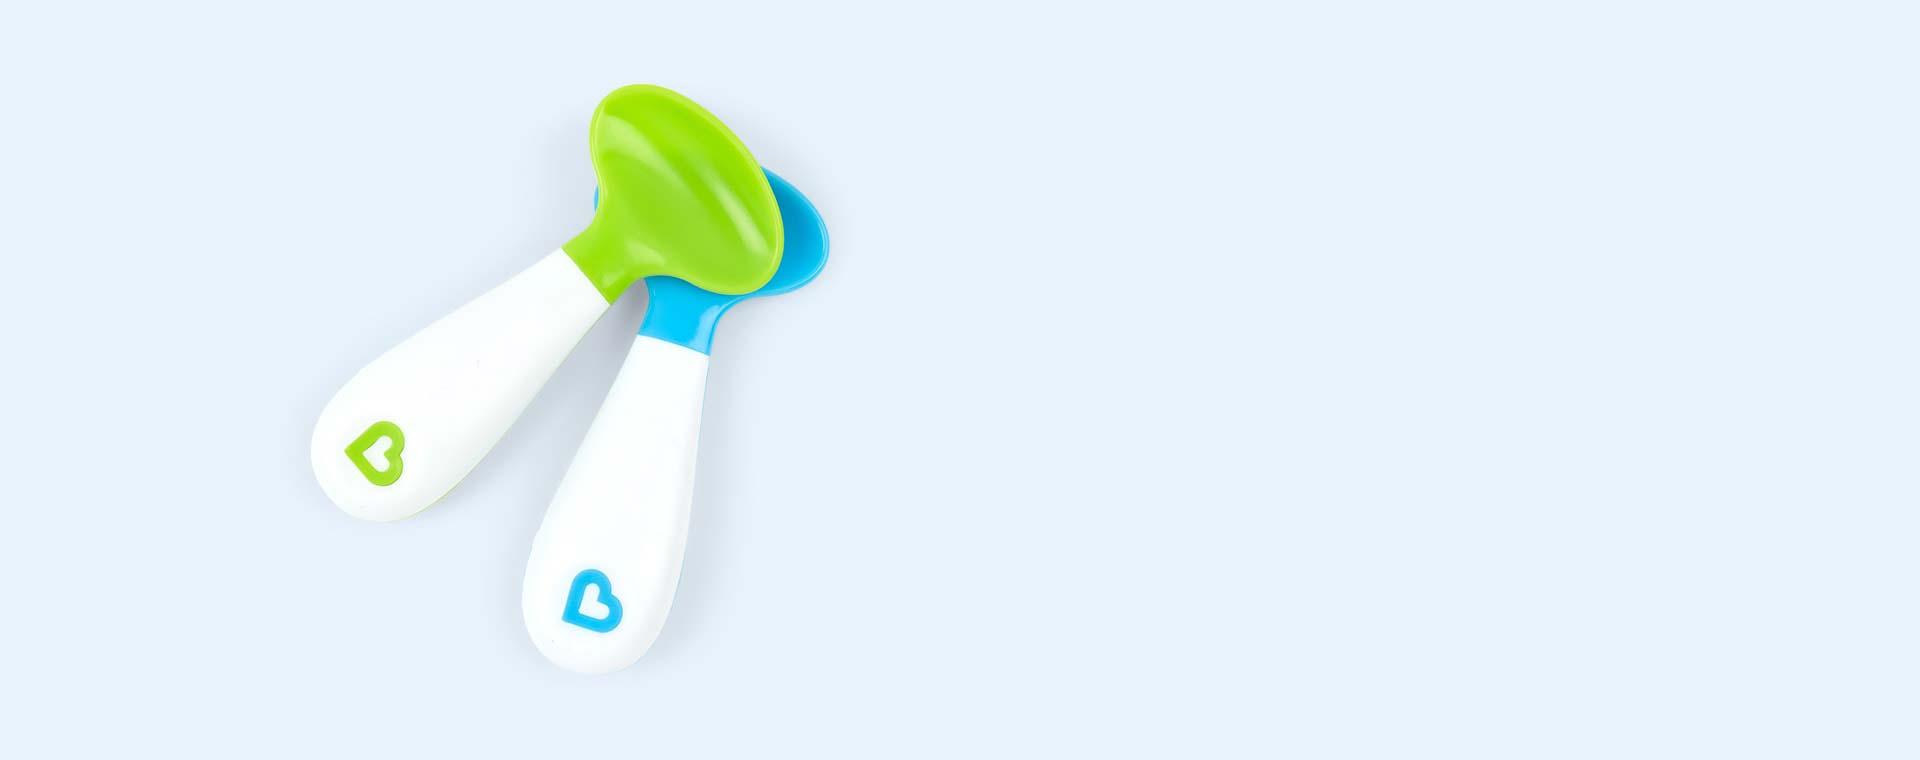 Green & Blue Munchkin Scooper Spoon 2 pack